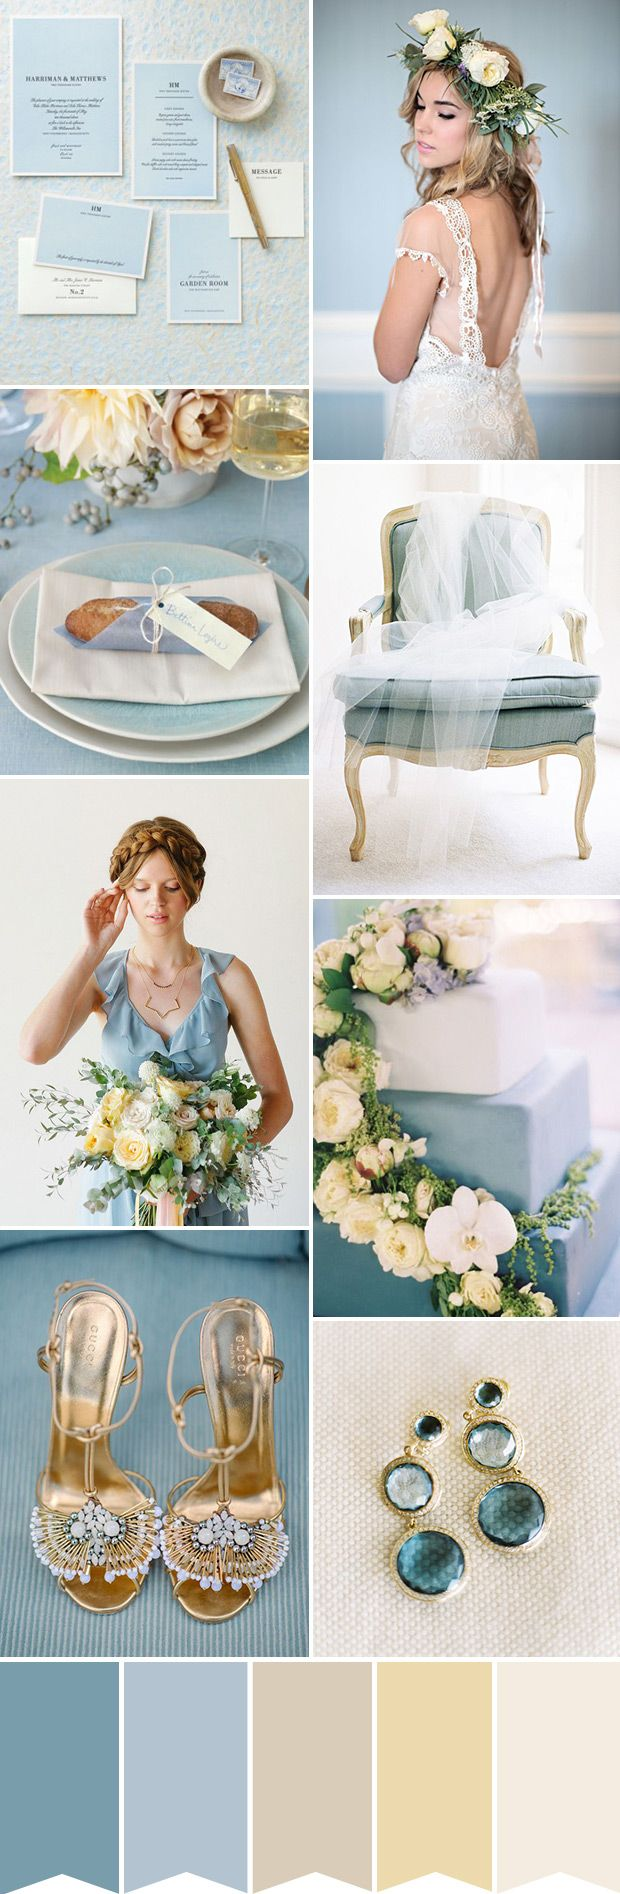 Creating a Romantic Blue and Cream Wedding Theme   Pinterest   Cream ...